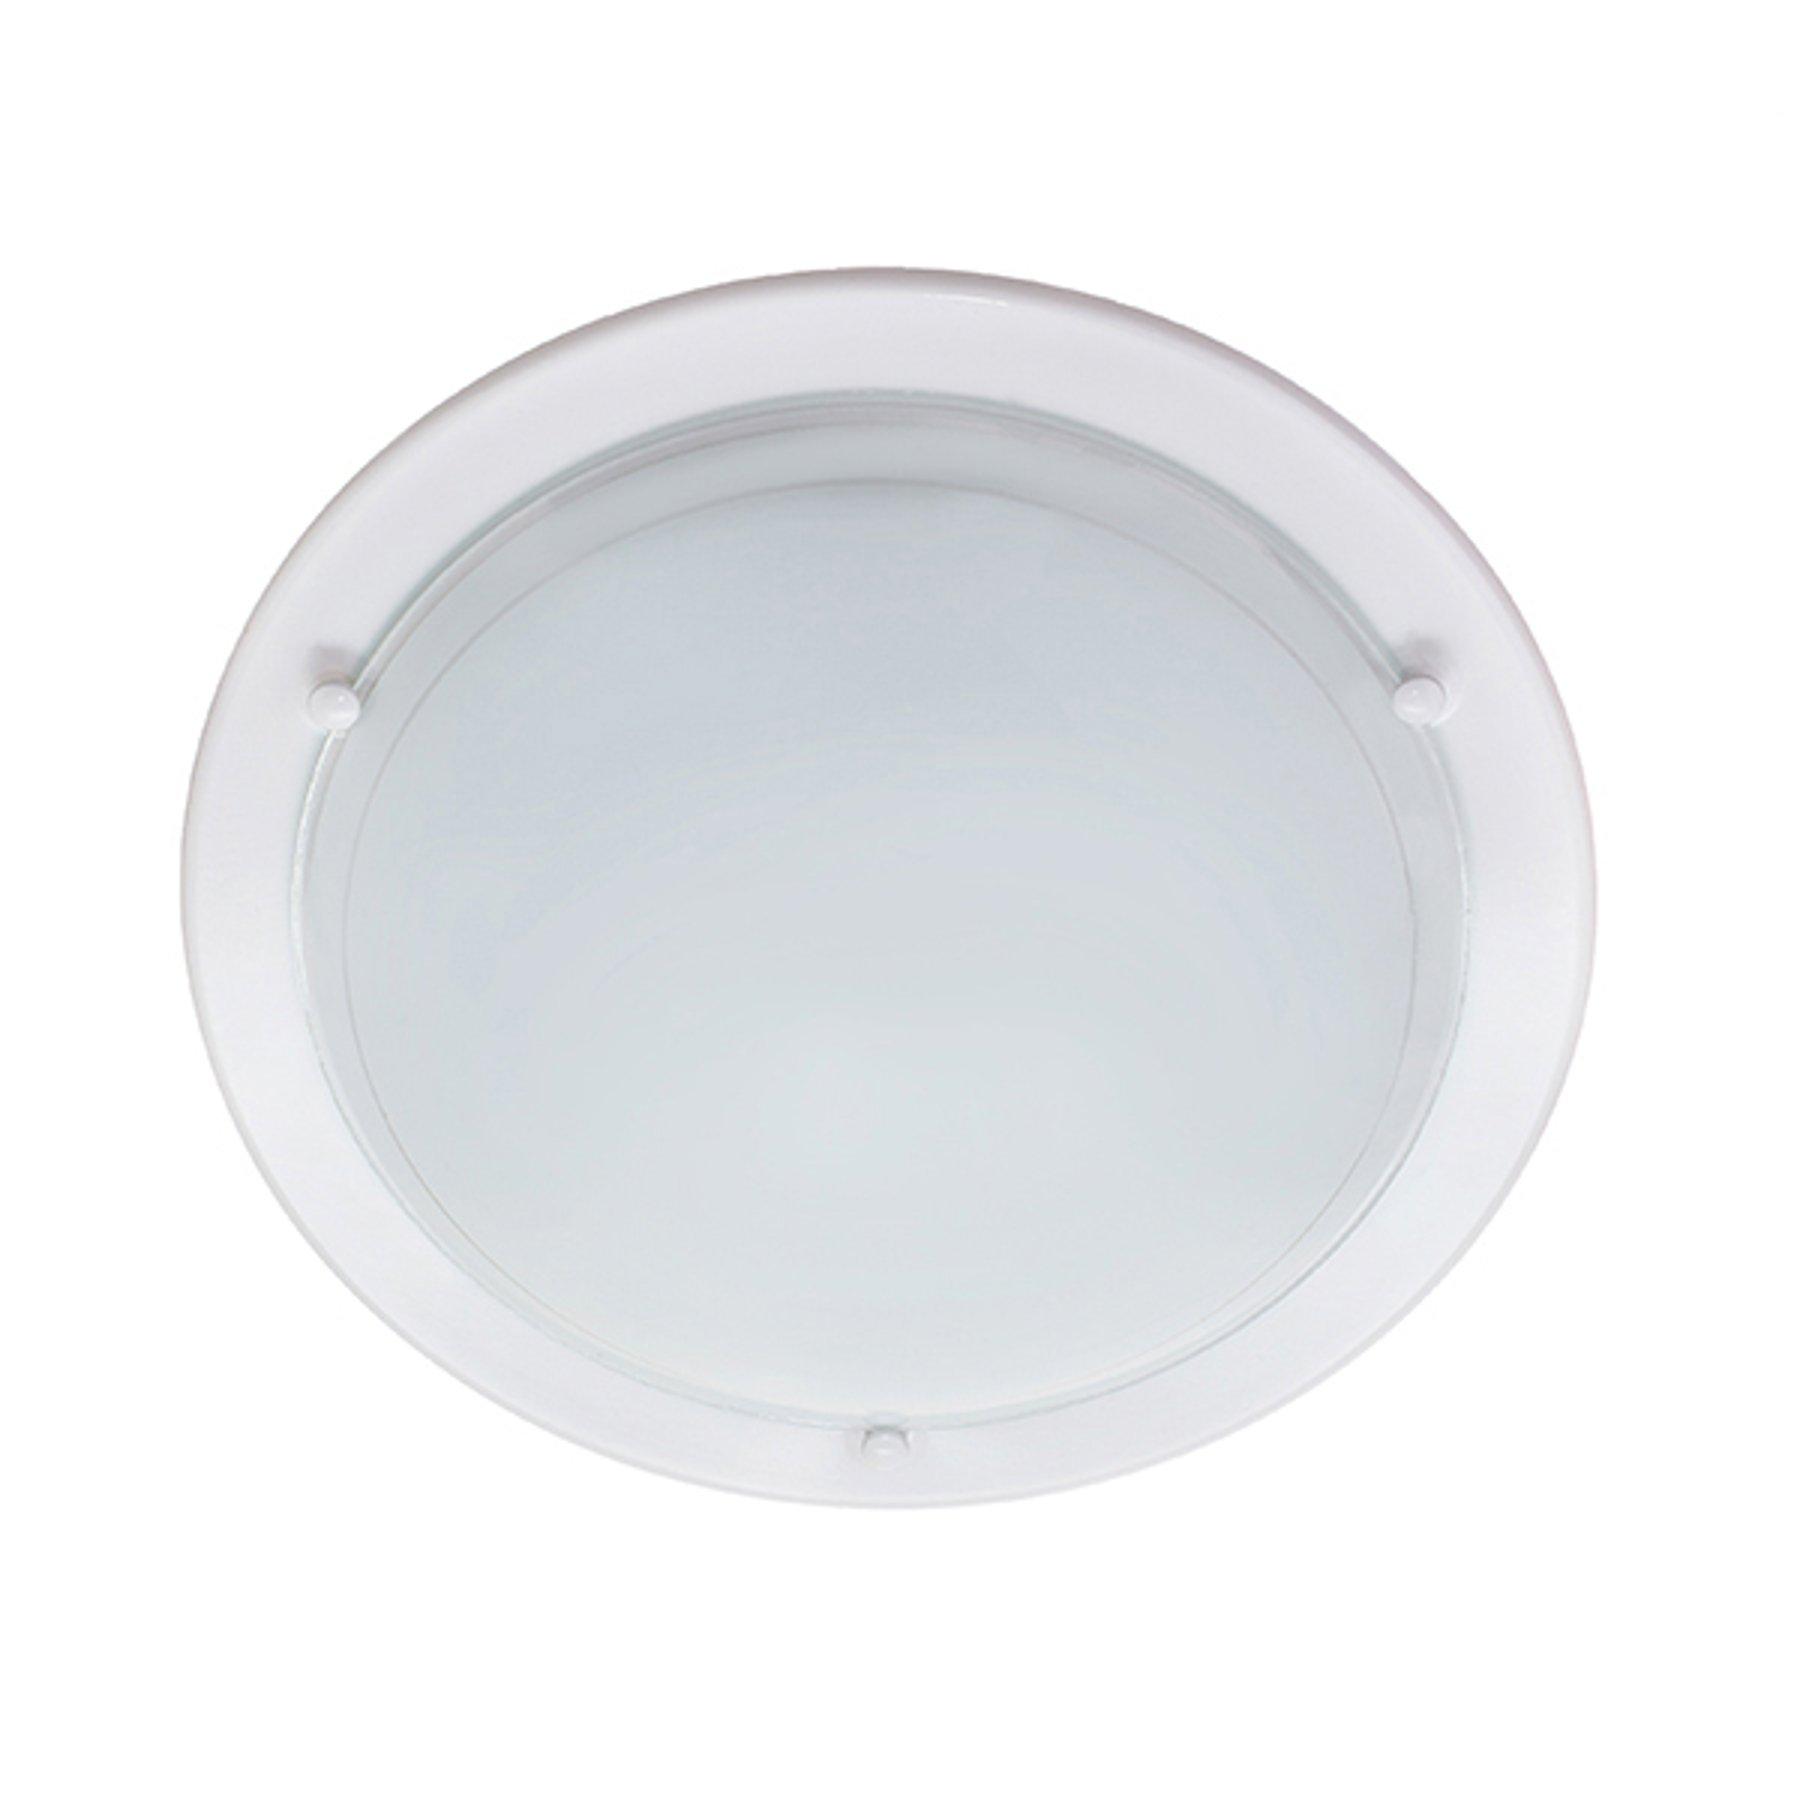 Taklampe P1B, hvit